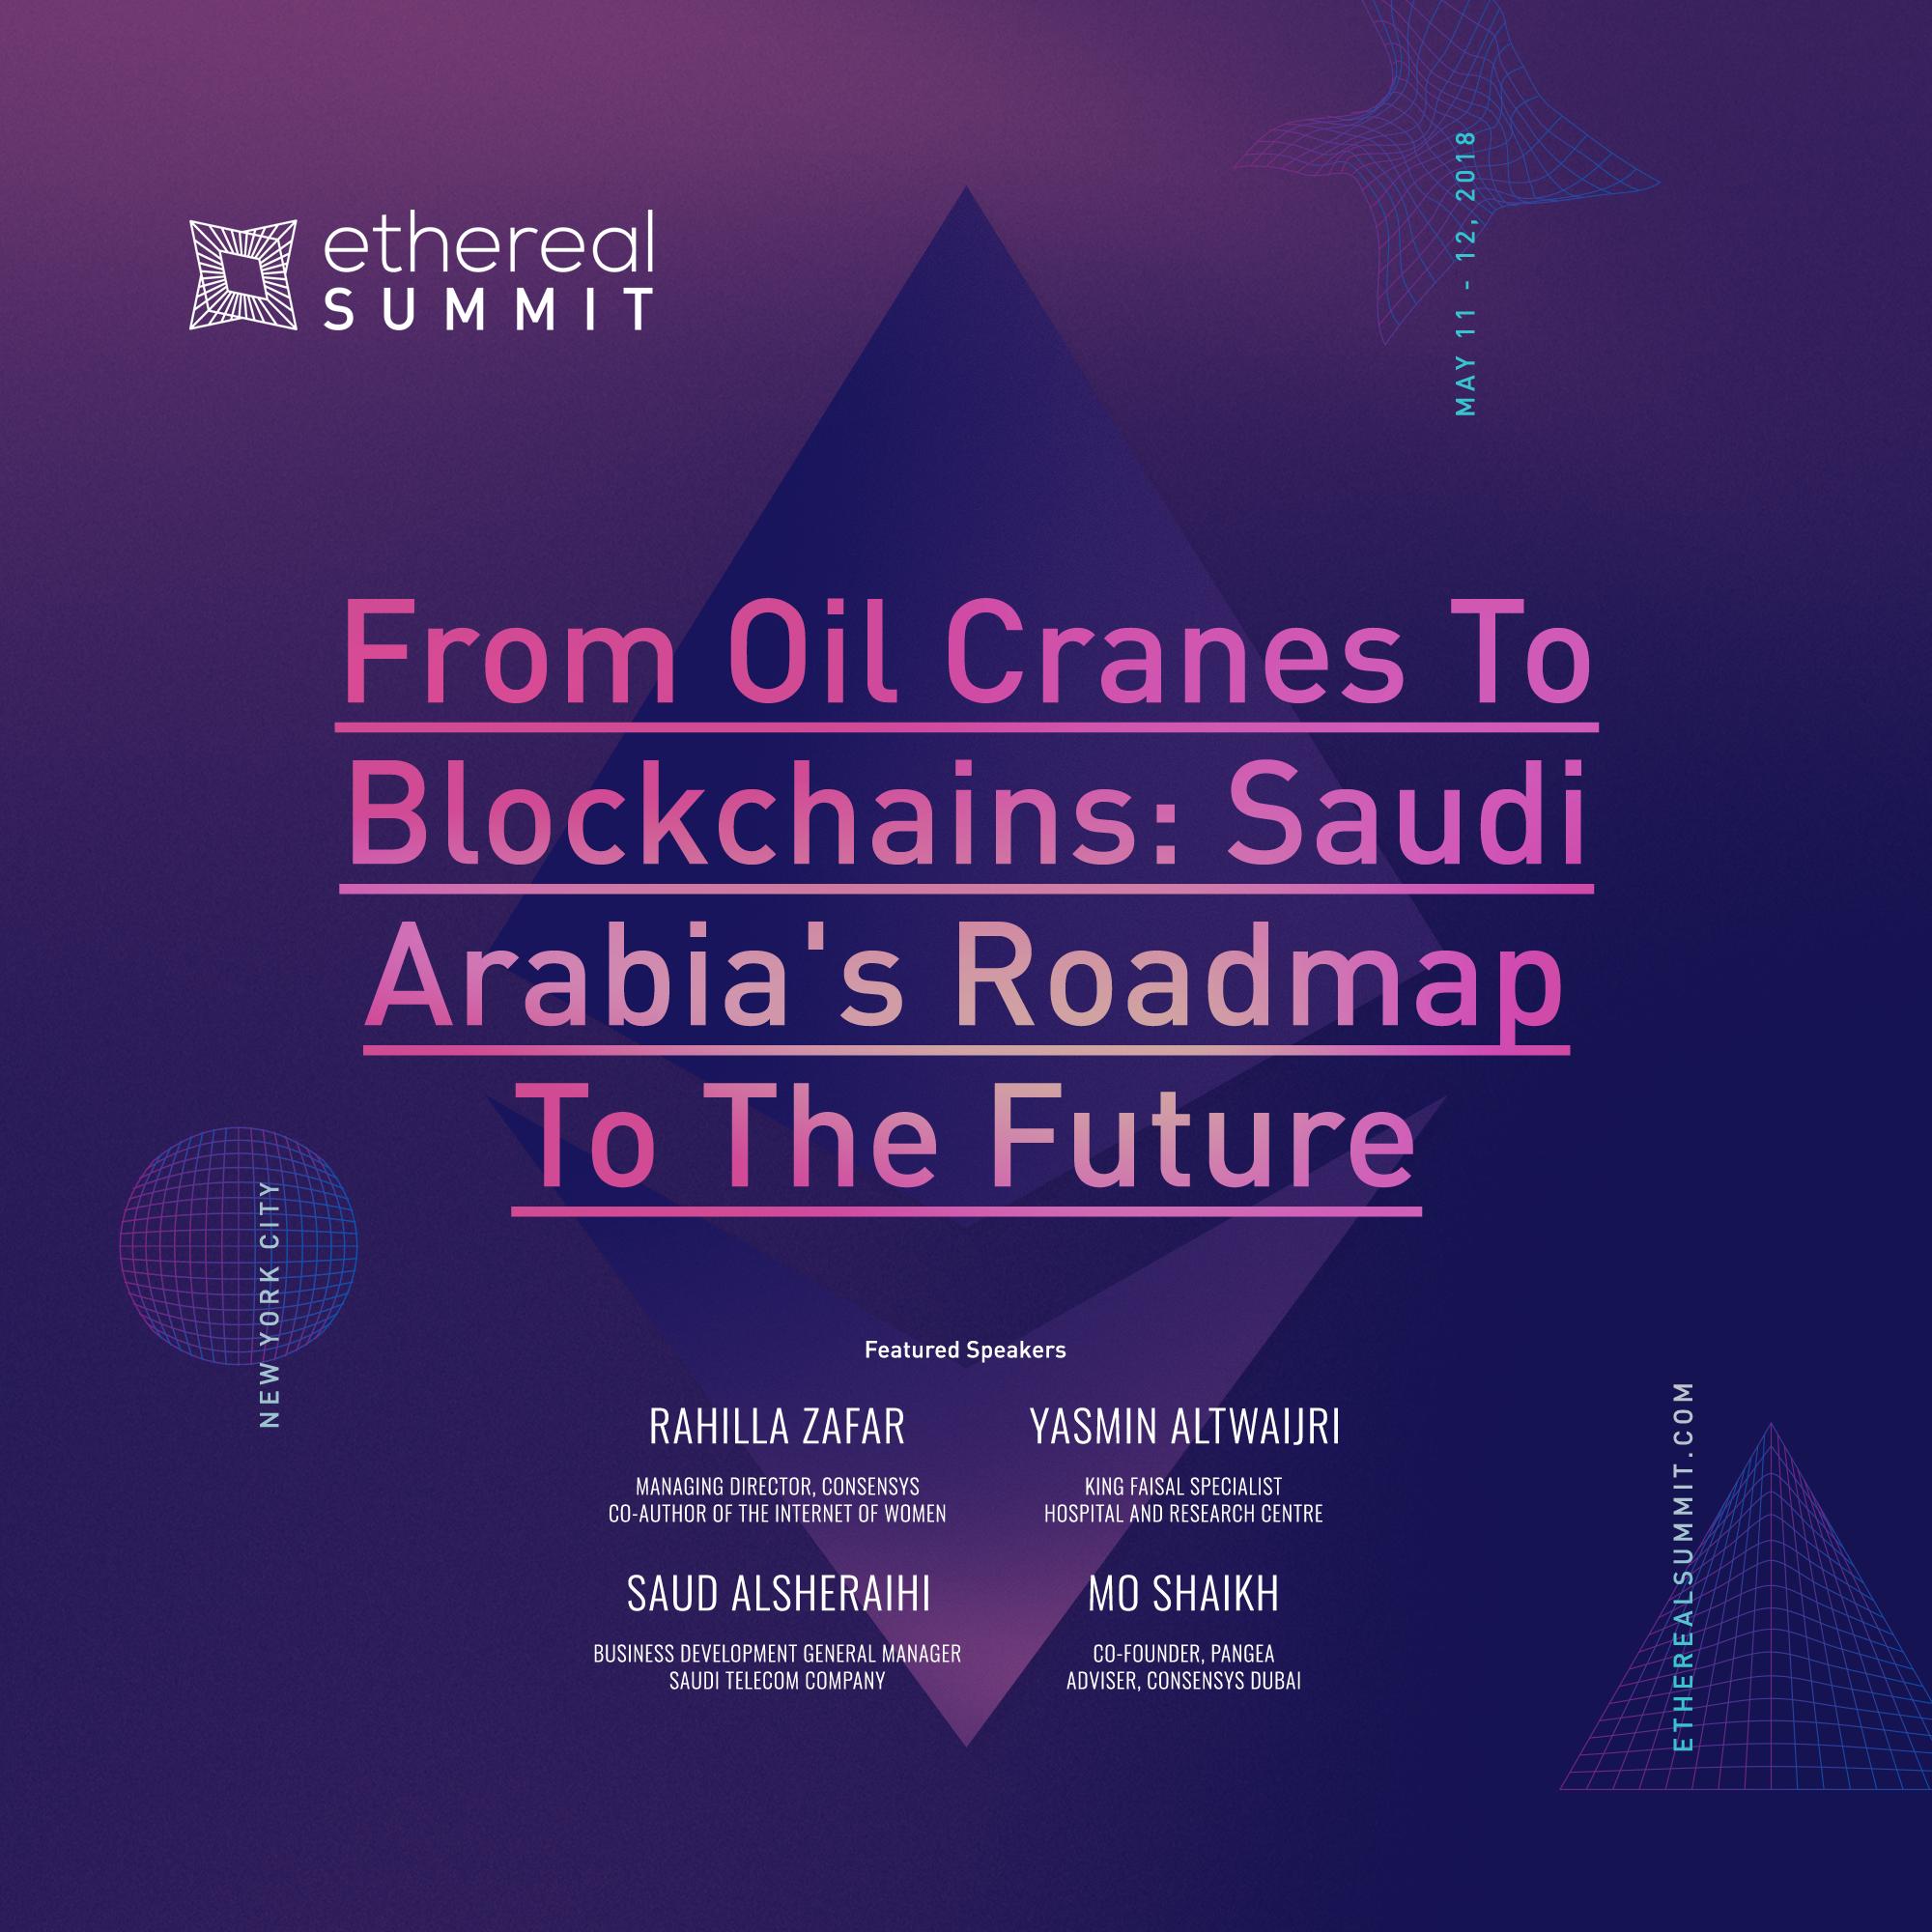 ethereal-2018-social-topics-oil-cranes-blockchains.png